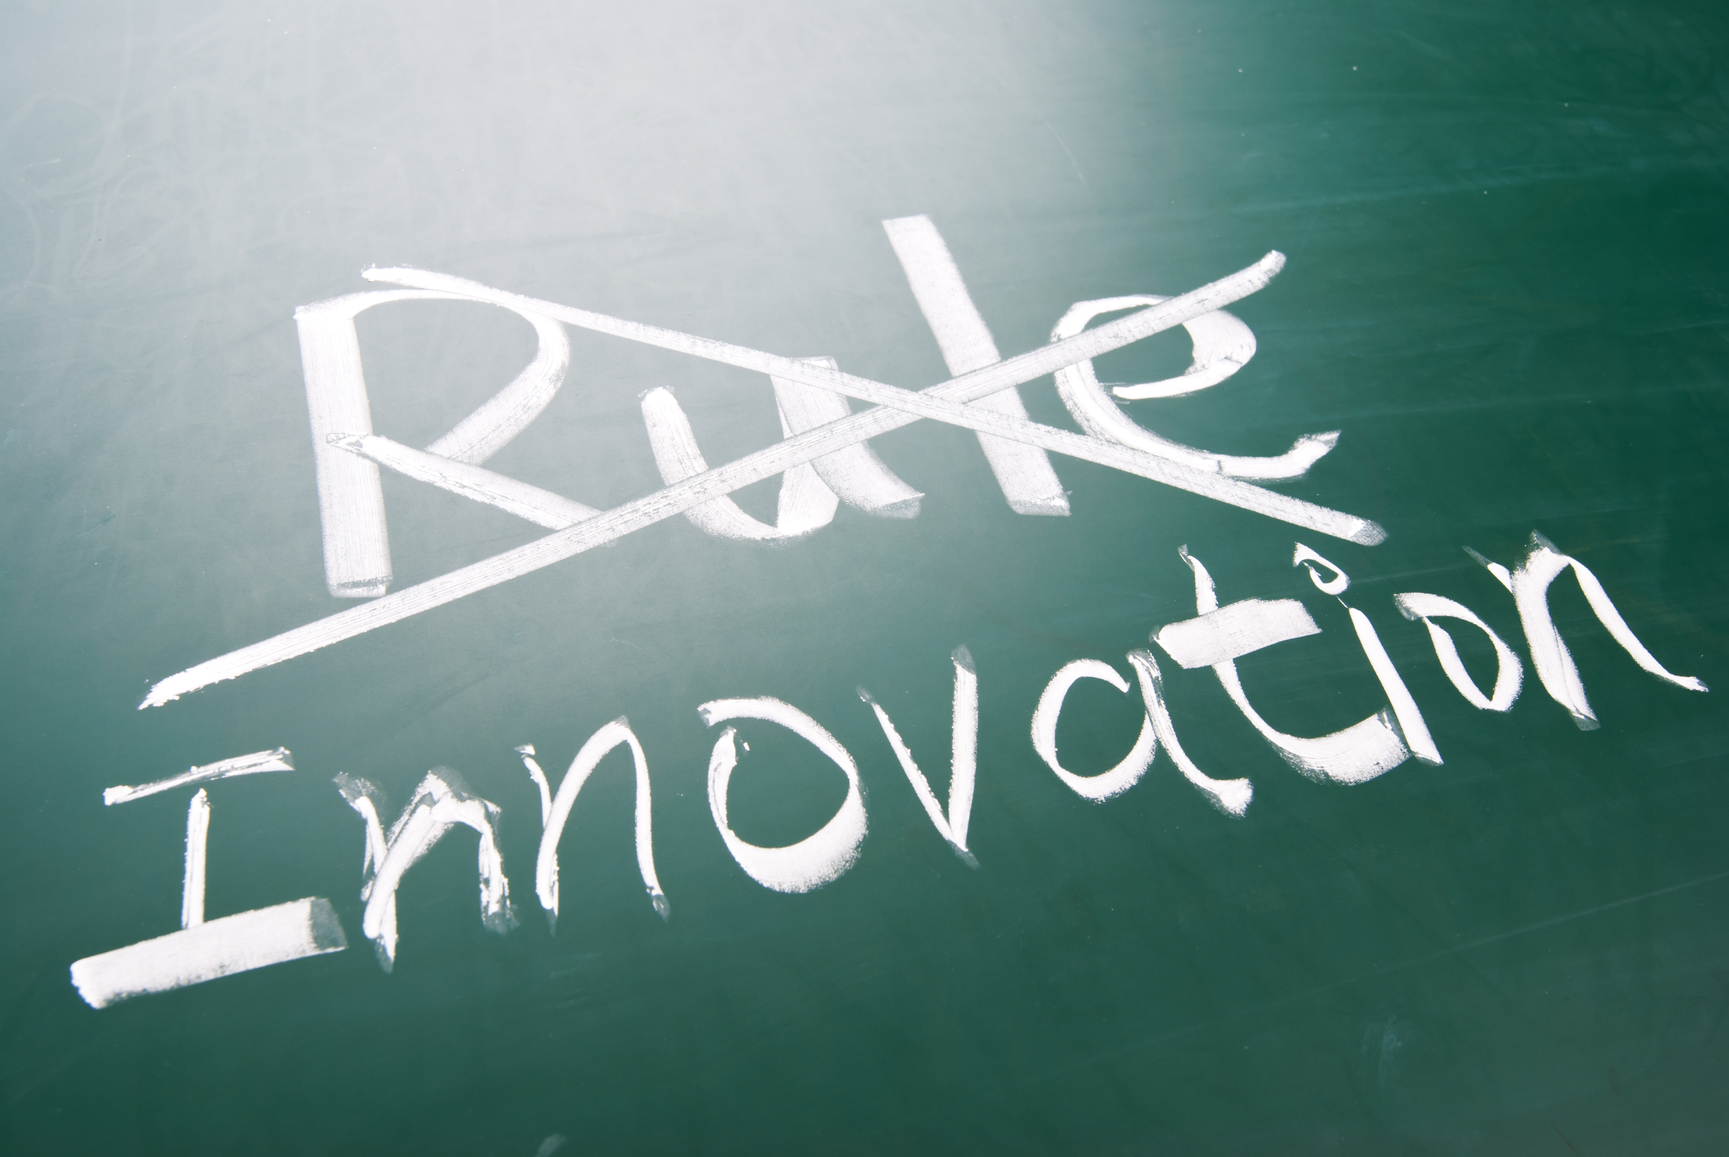 Break The Rule For Innovation, Conceptual Words On Blackboard